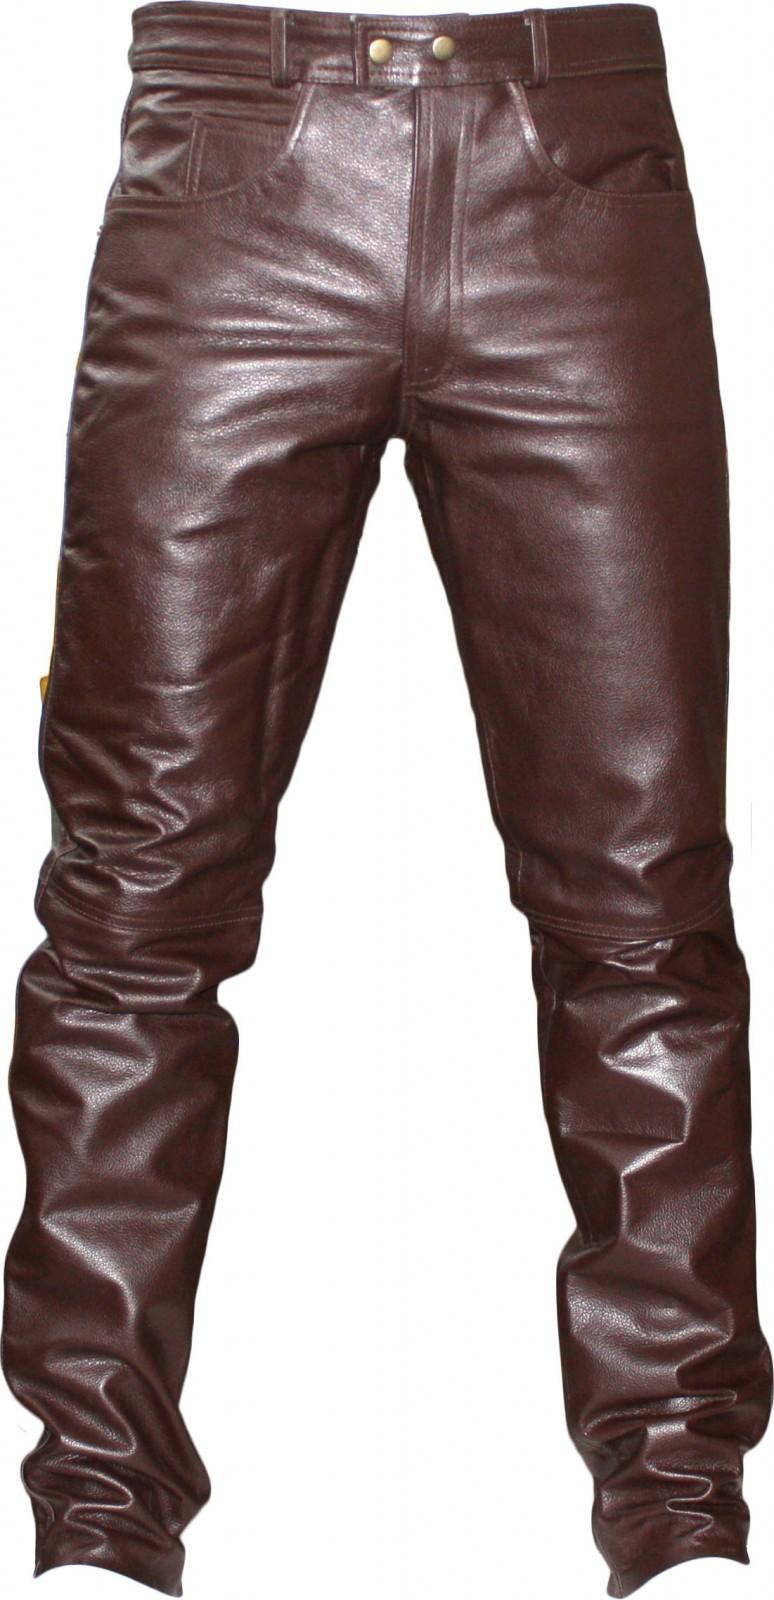 Коричневые кожаные штаны